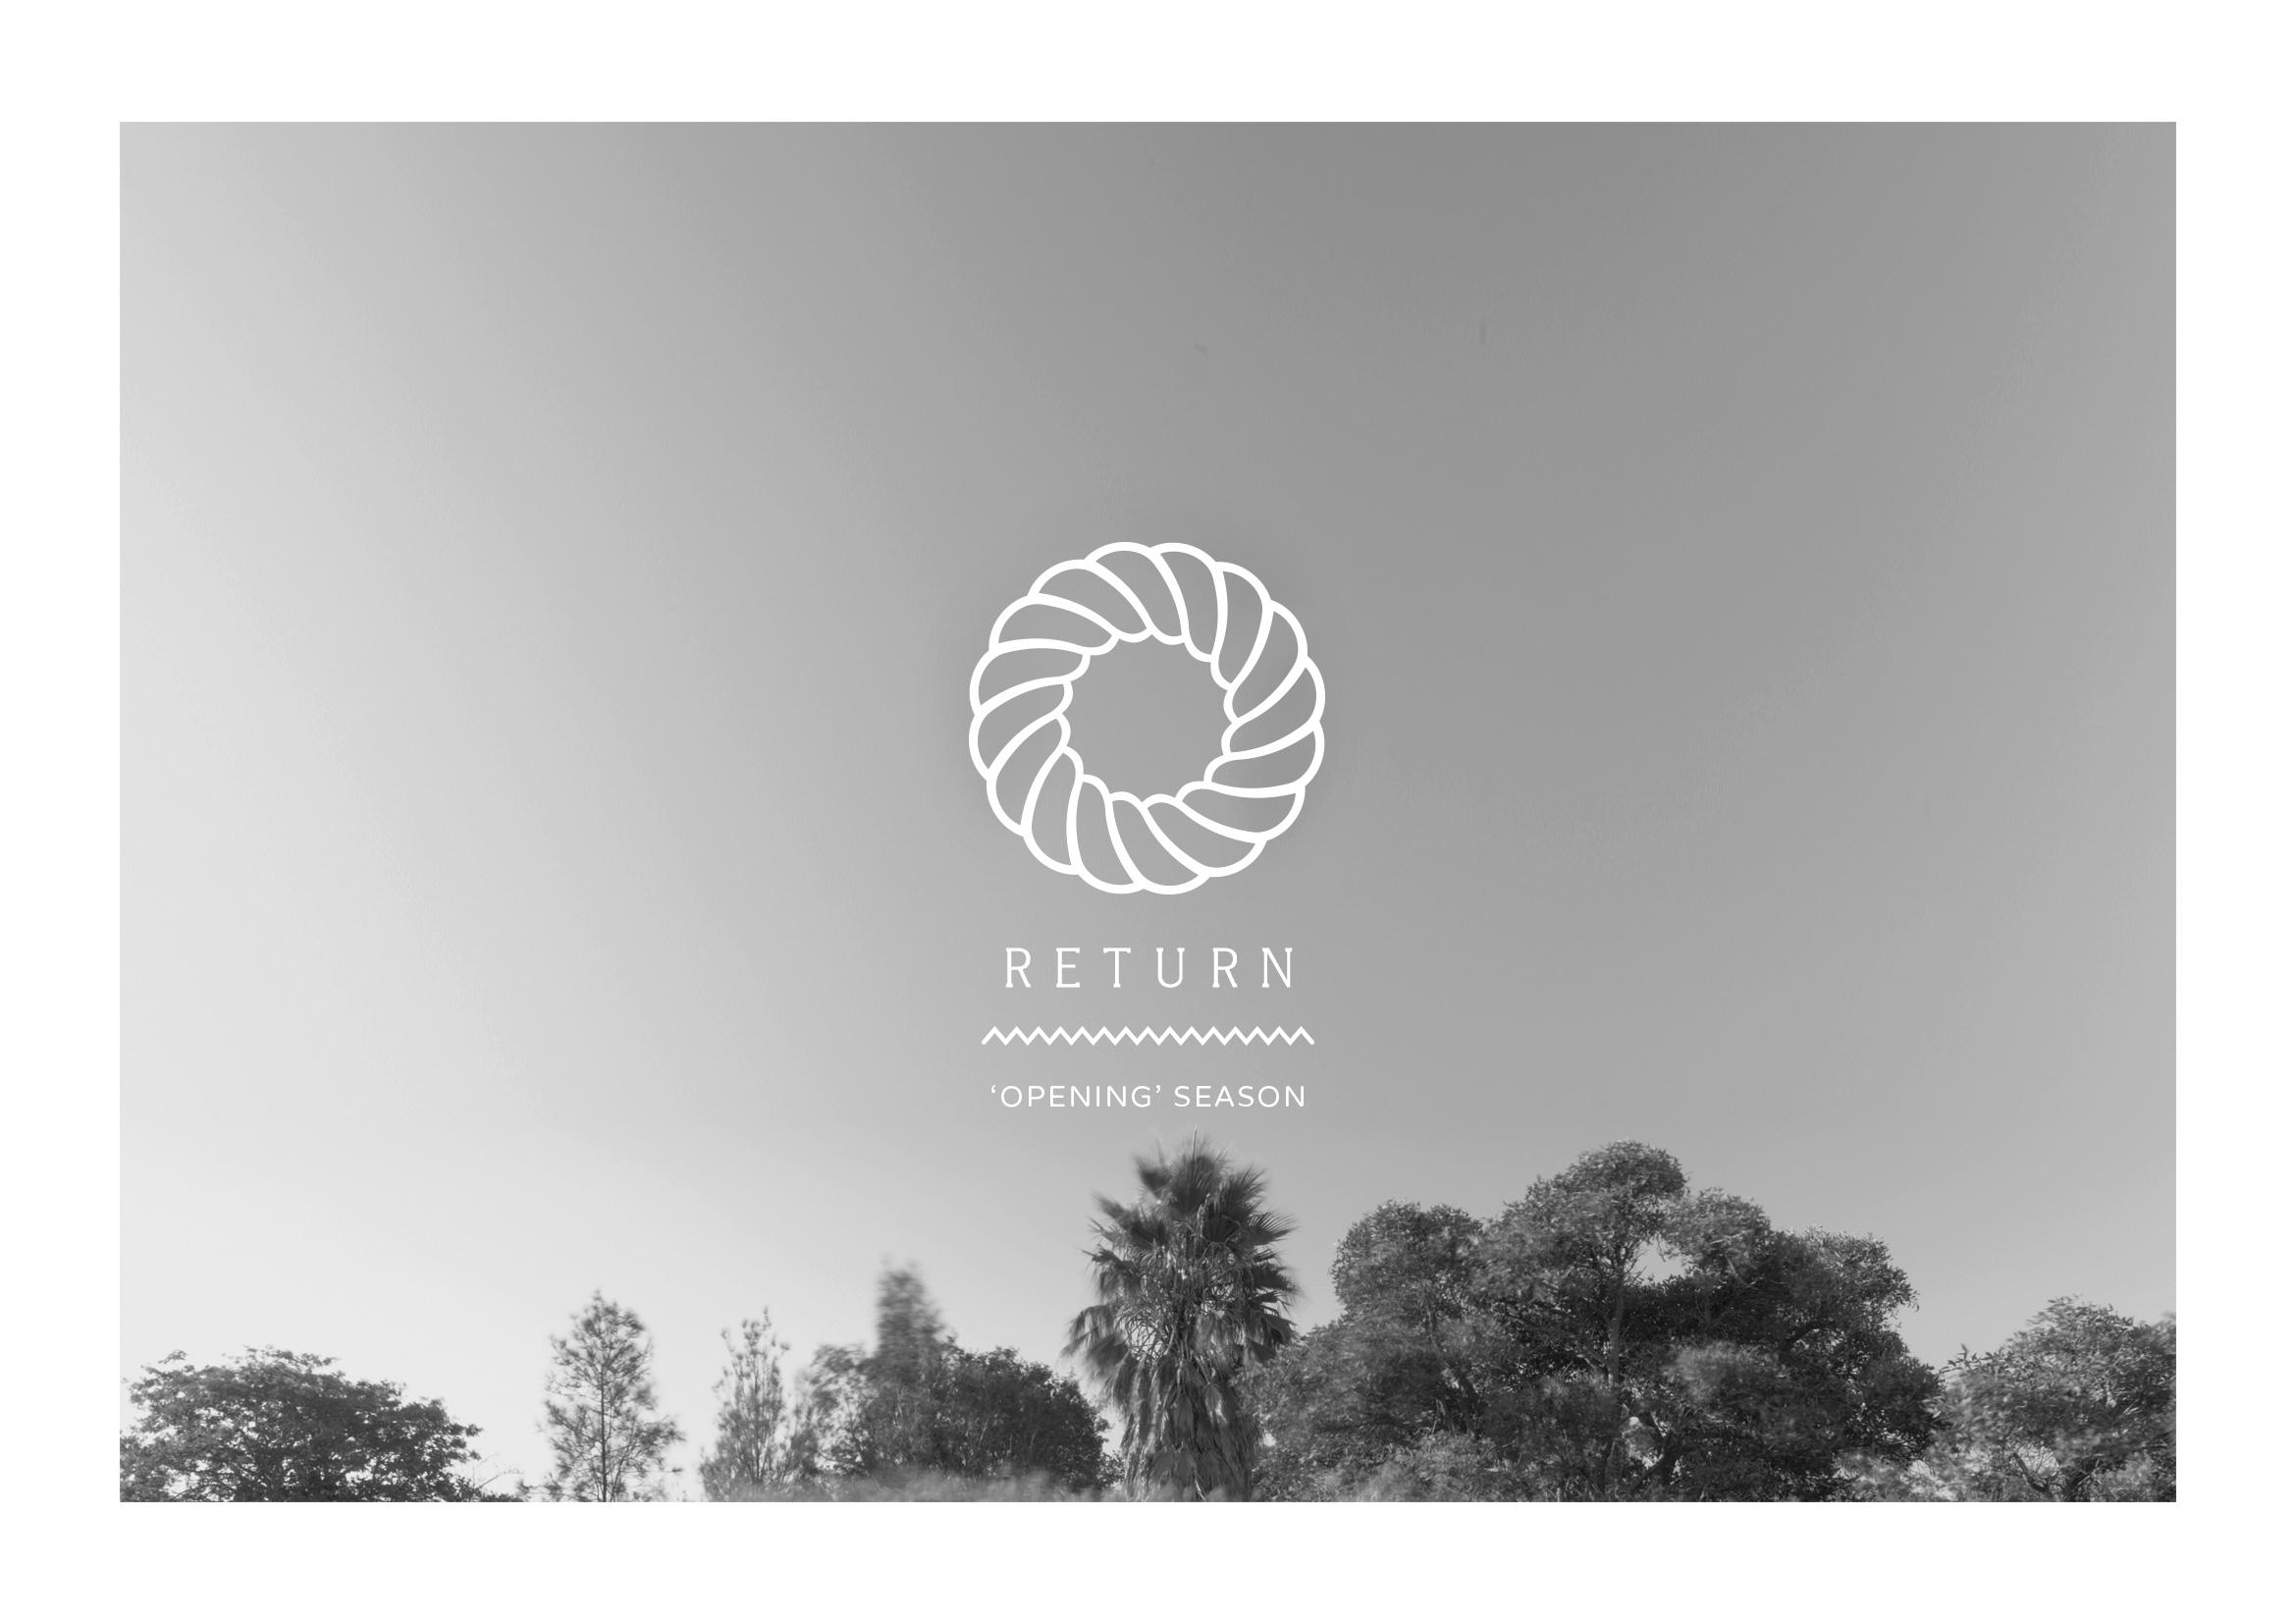 Return_lookbook1_1alt.jpg